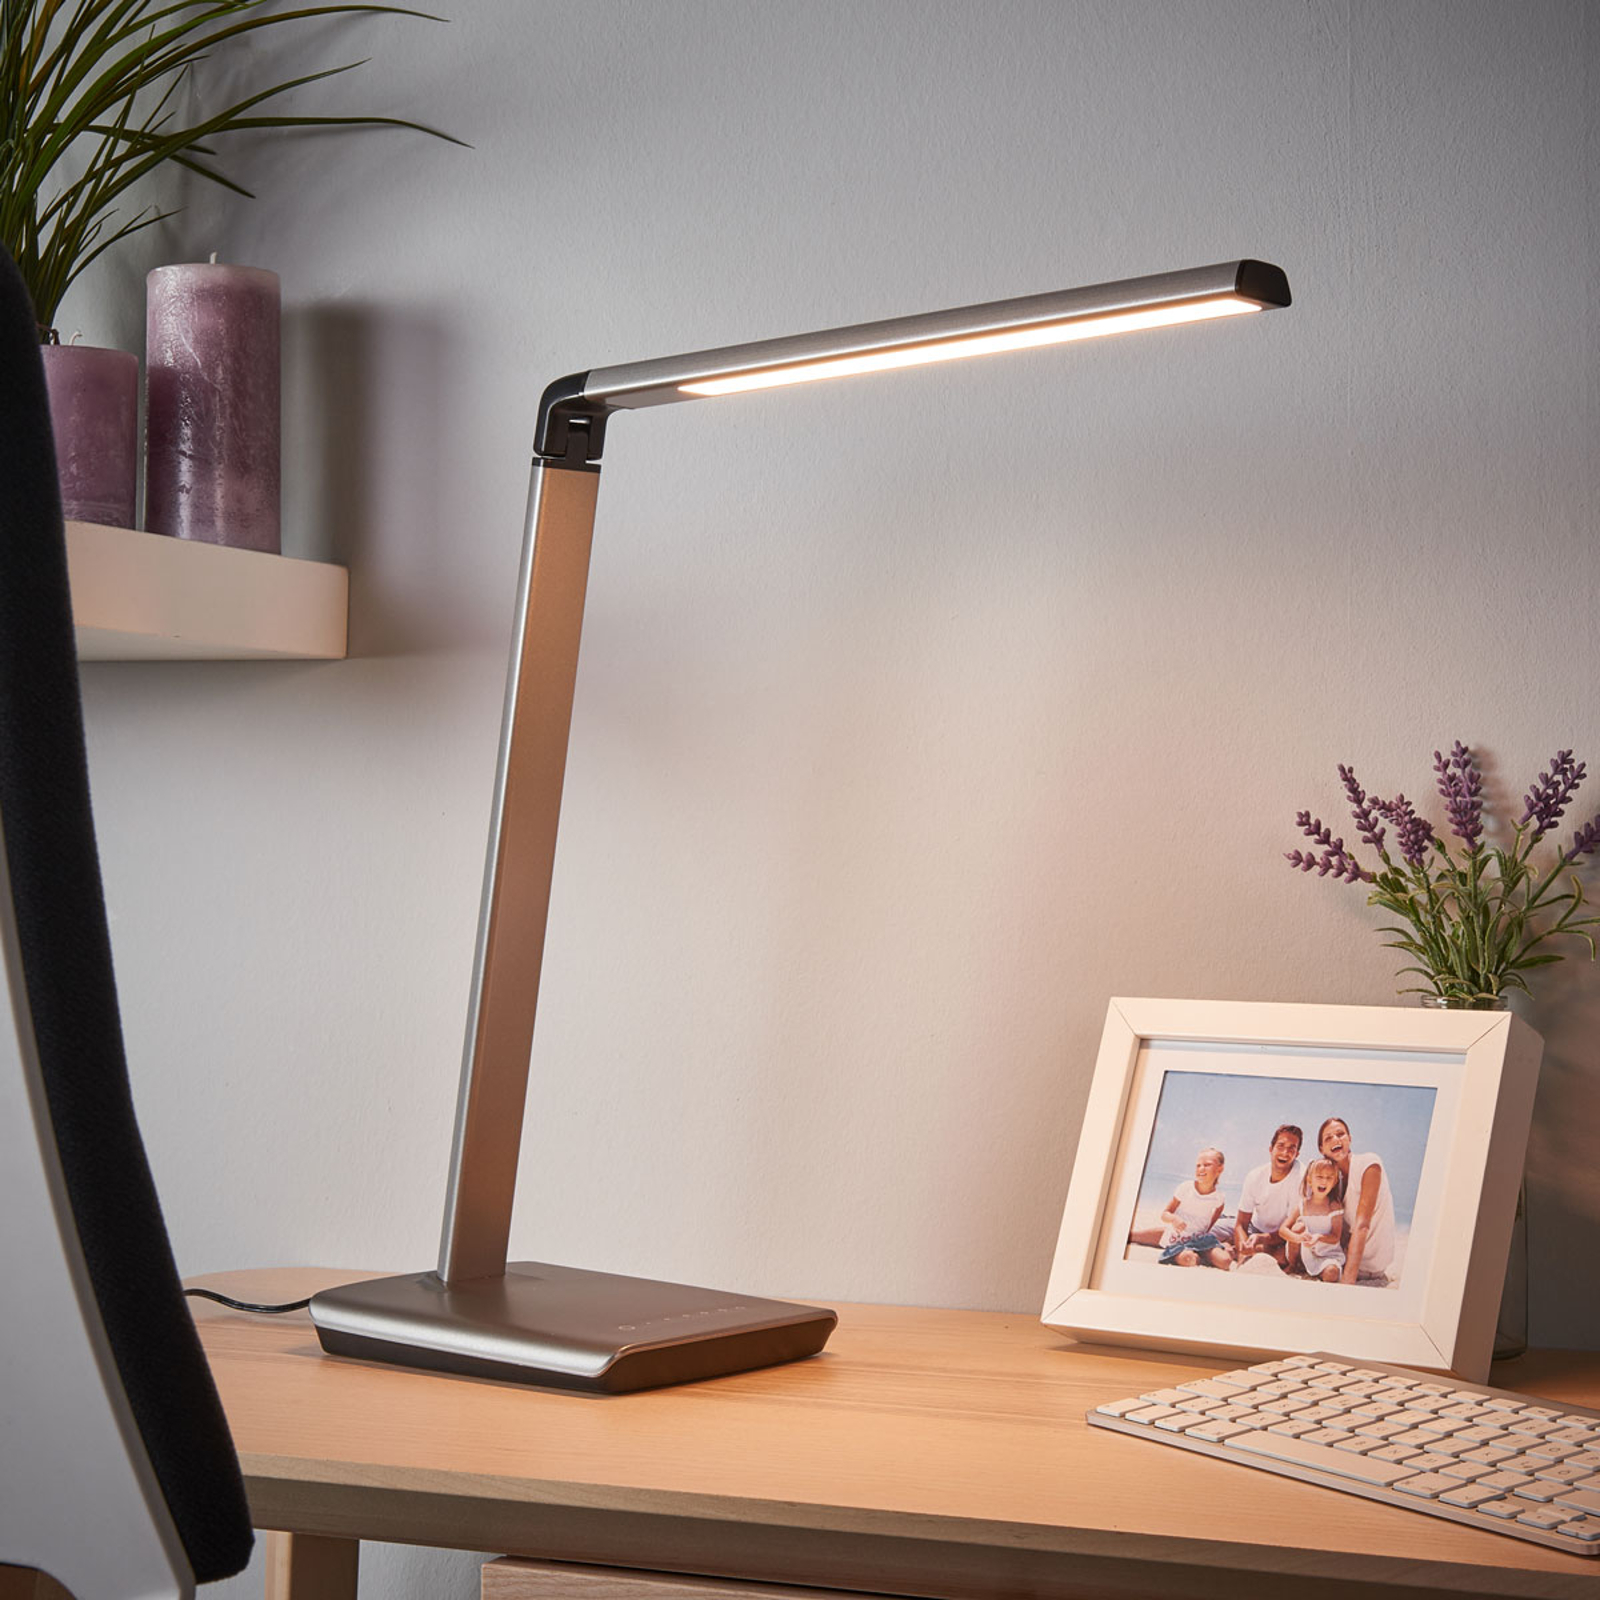 Metallic grey LED table lamp Kuno with dimmer, USB_9643036_1